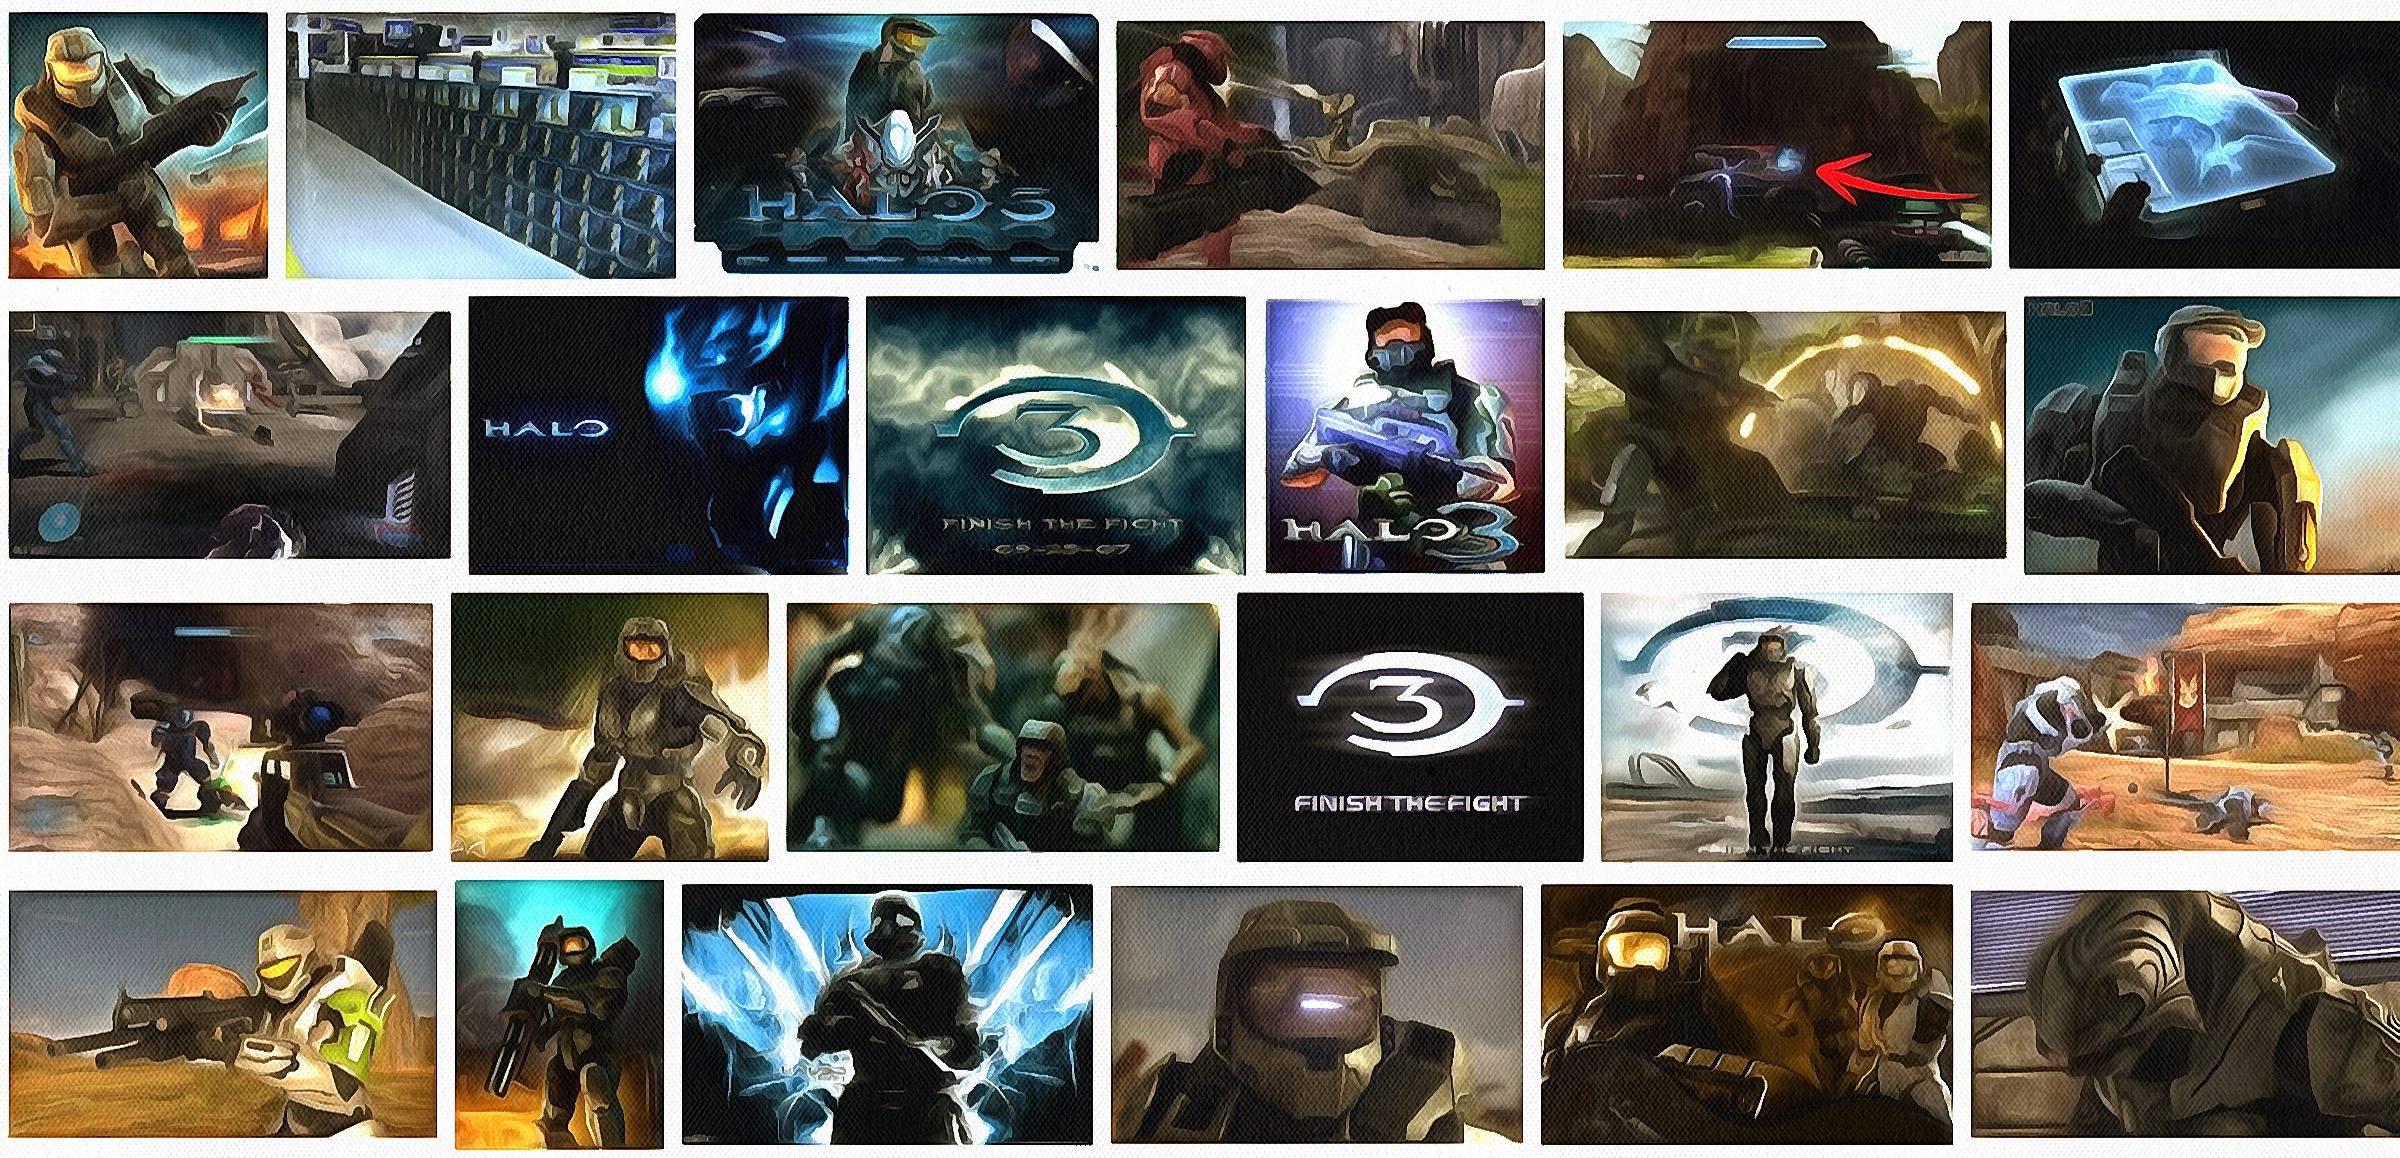 Halo 3 Funny